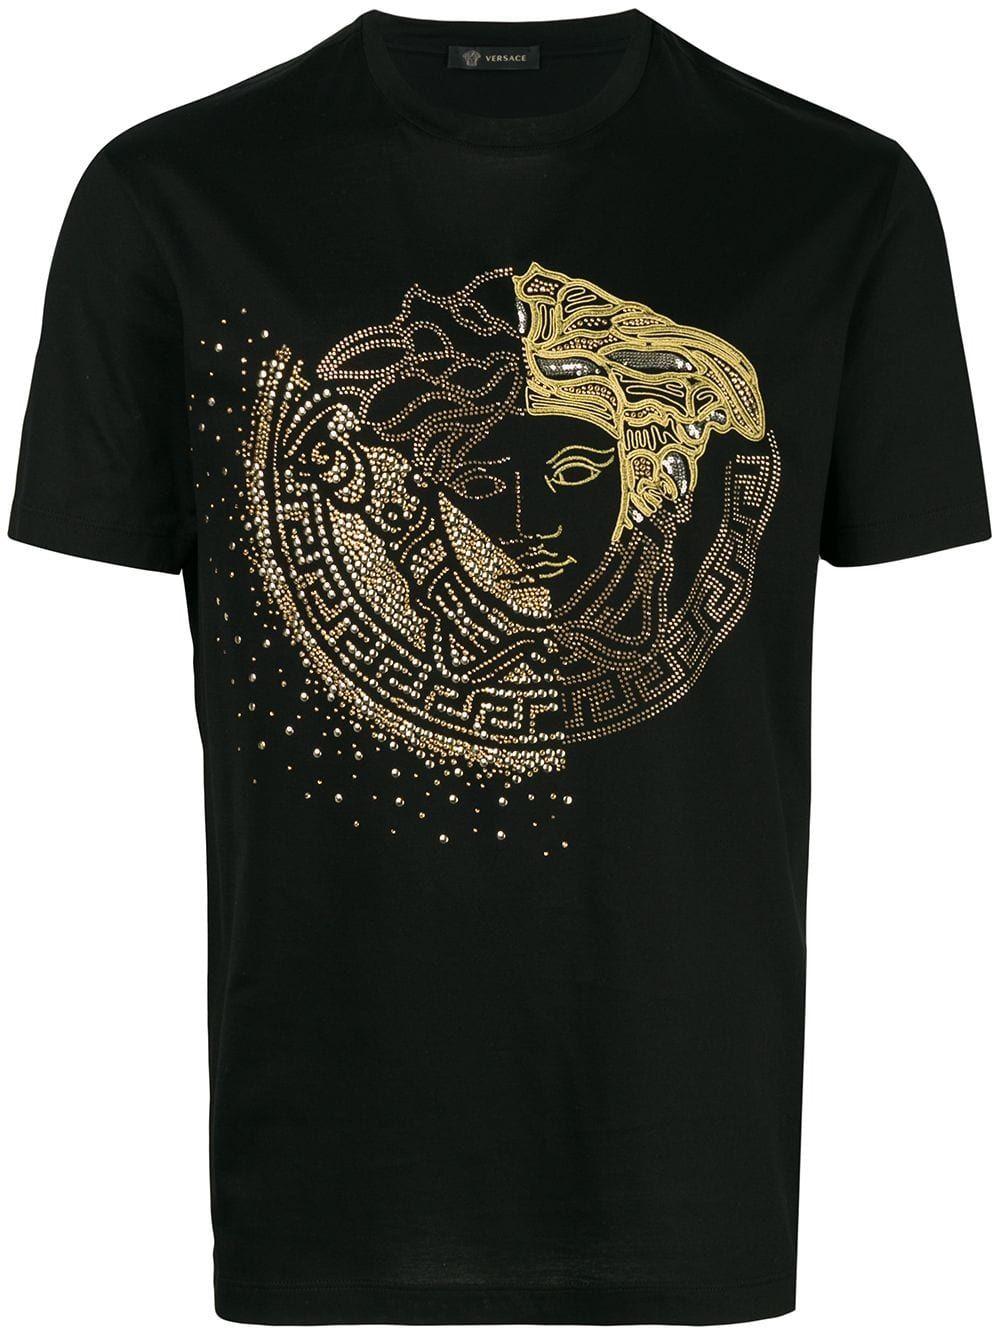 Versace Embellished Medusa T Shirt Black Versace Men Versace T Shirt Tshirt Outfits